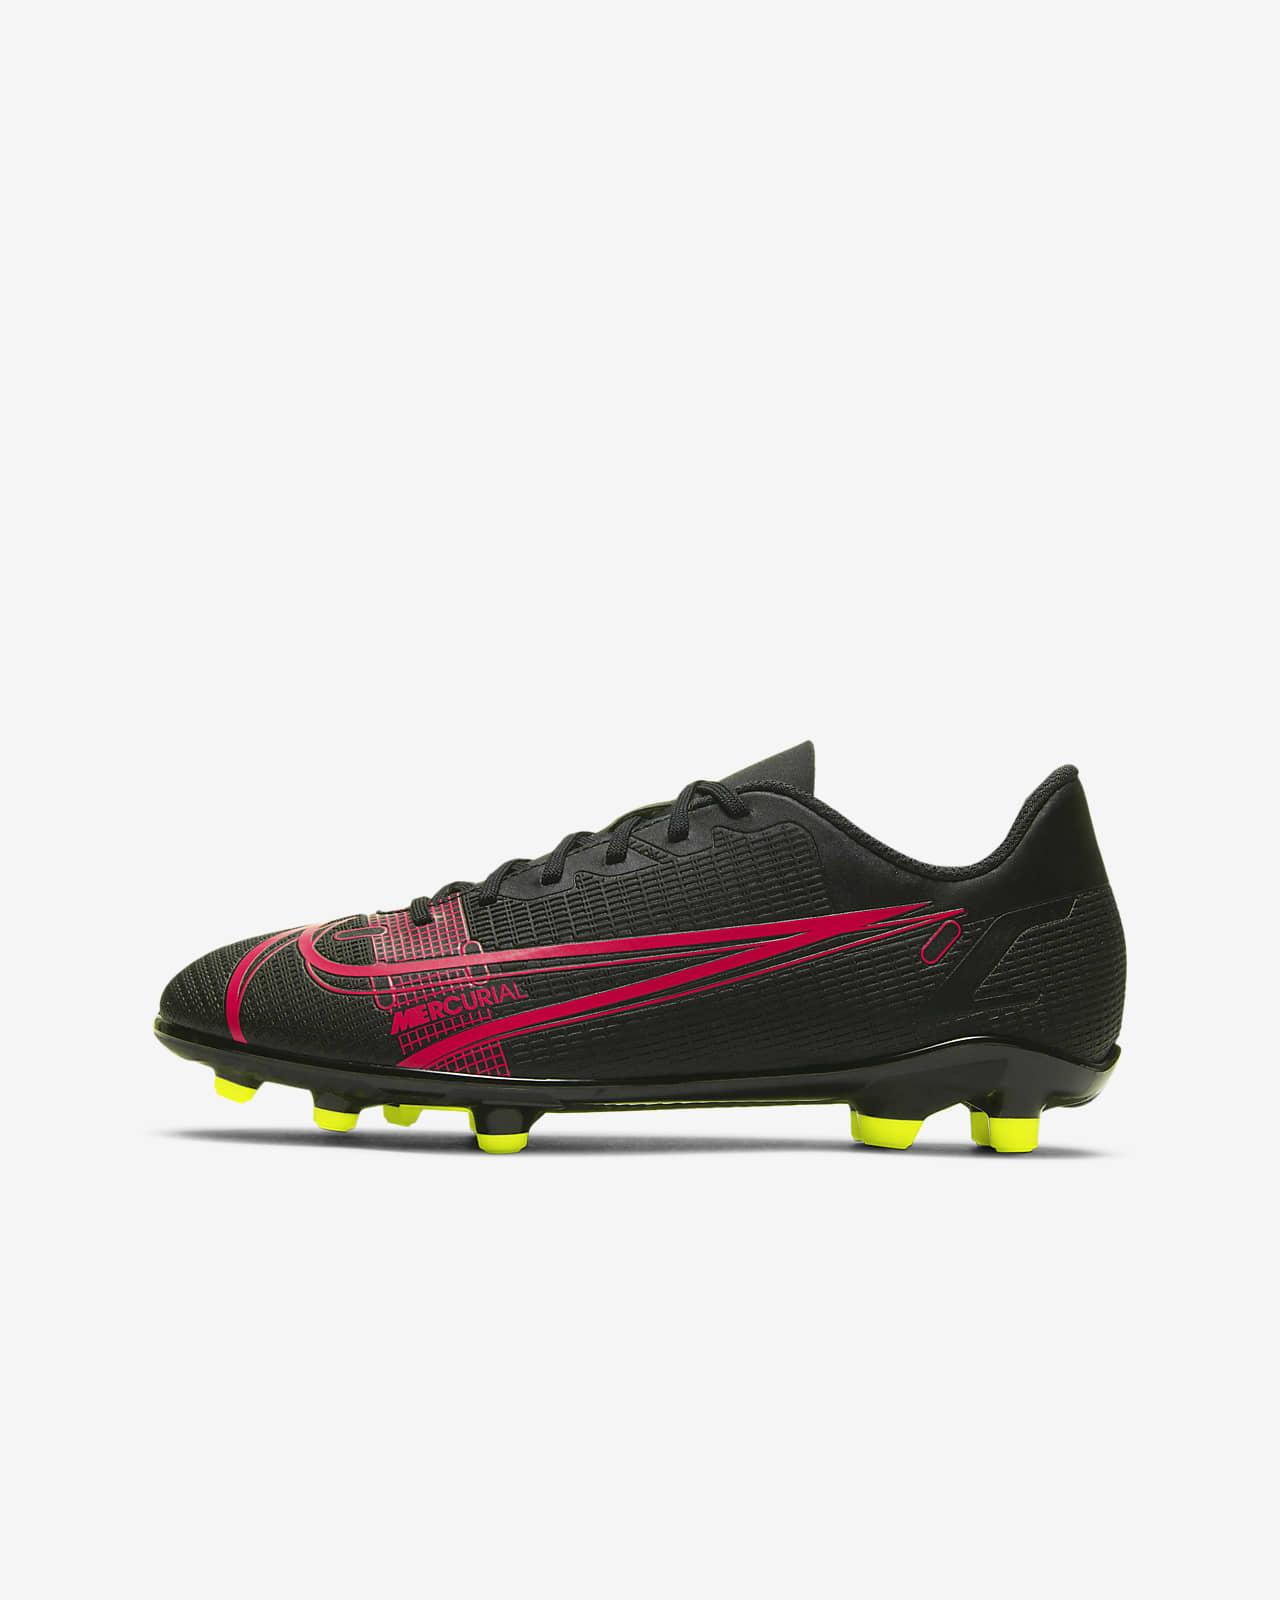 Scarpa da calcio multiterreno Nike Jr. Mercurial Vapor 14 Club FG/MG - Bambini/Ragazzi